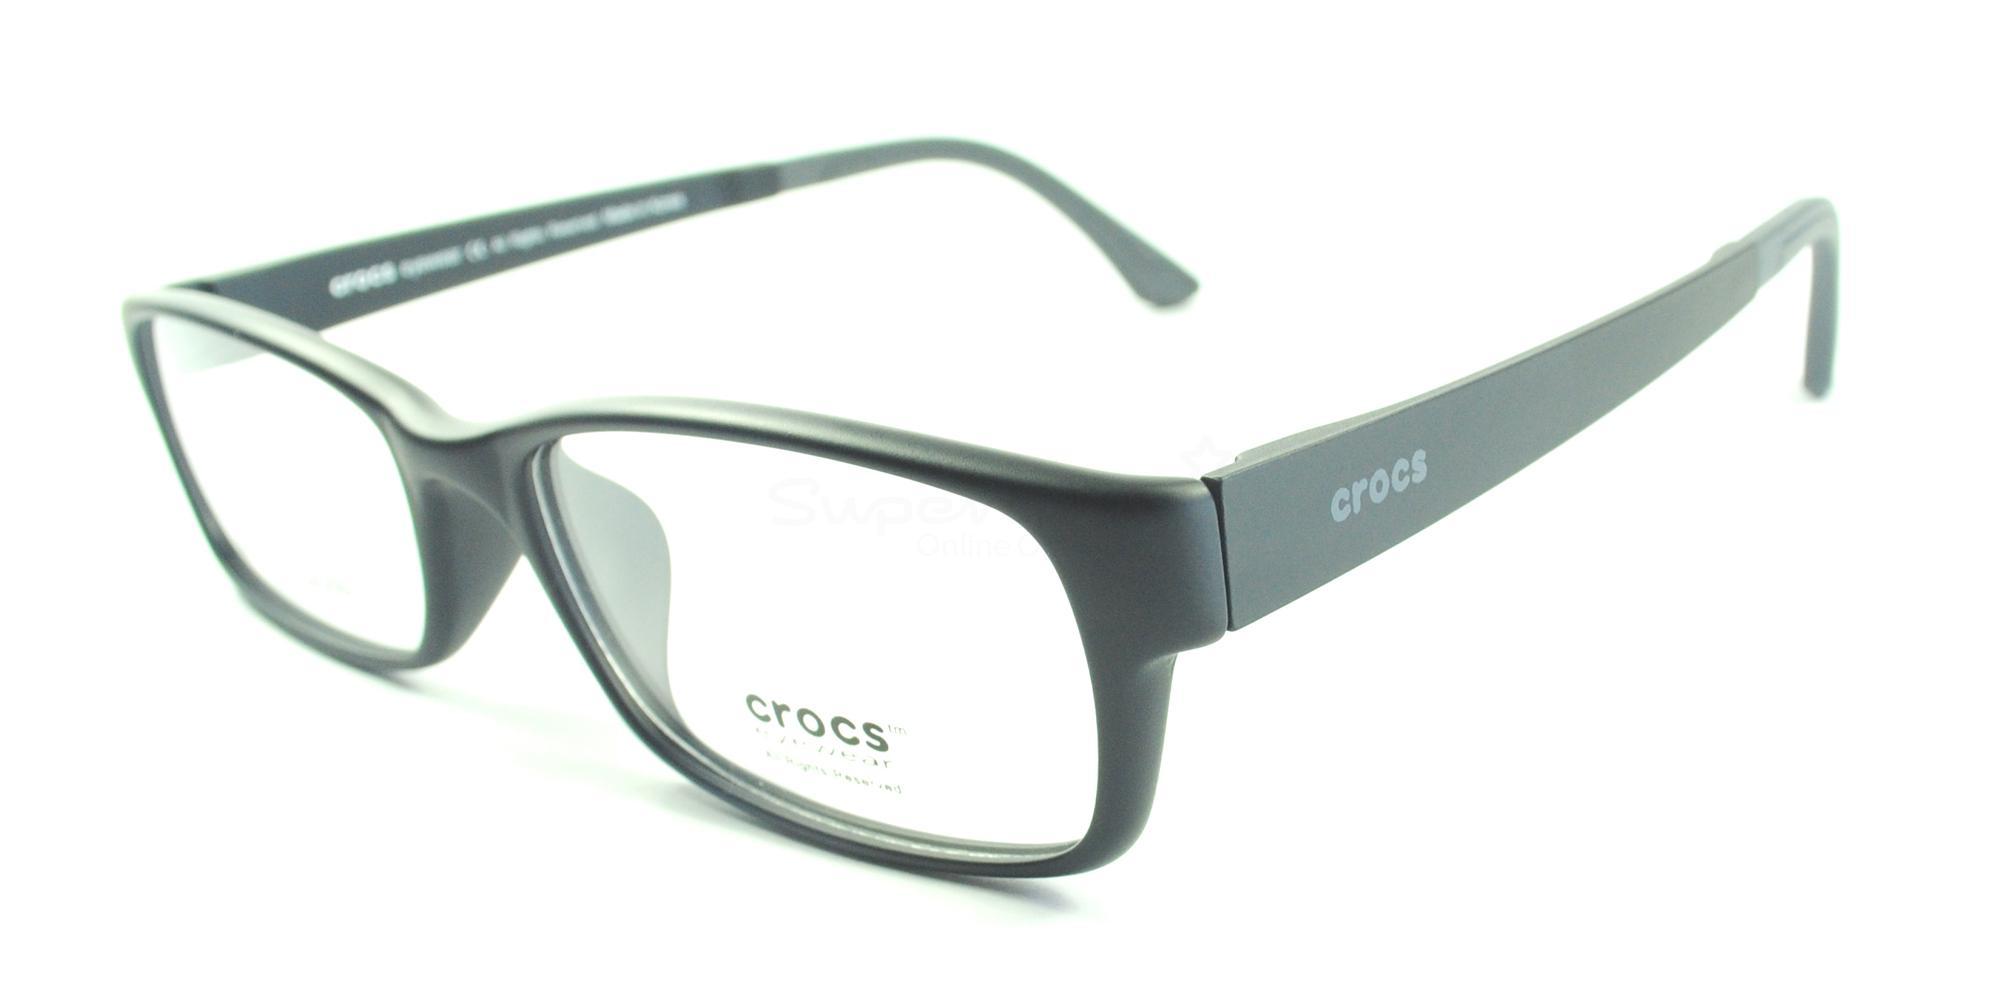 20BK CF624 , Crocs Eyewear